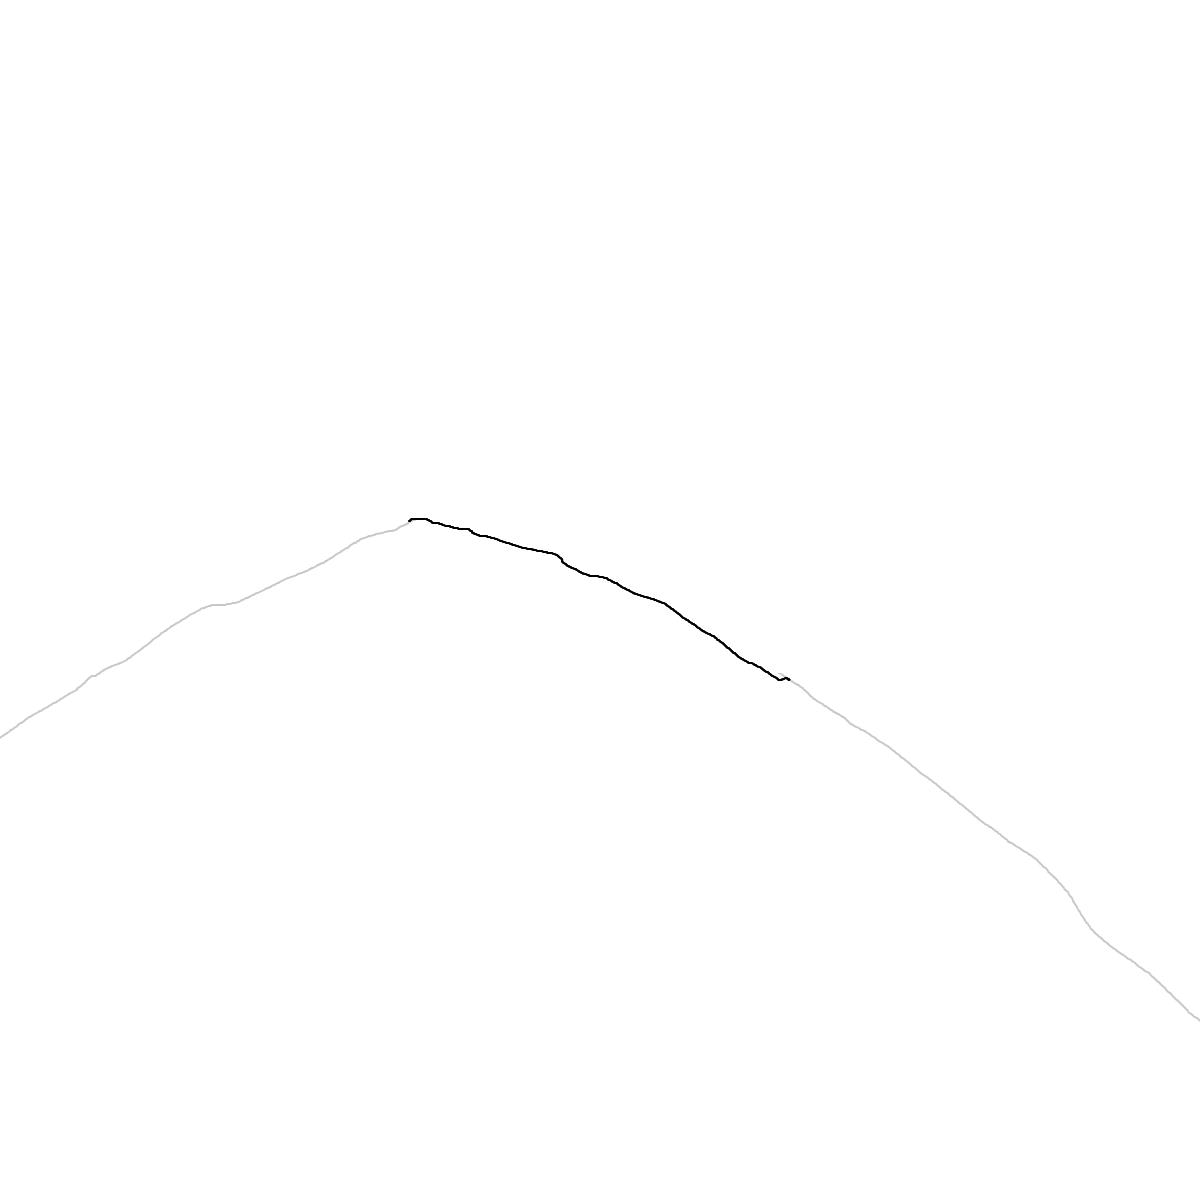 BAAAM drawing#16080 lat:39.0971717834472660lng: -84.5064315795898400